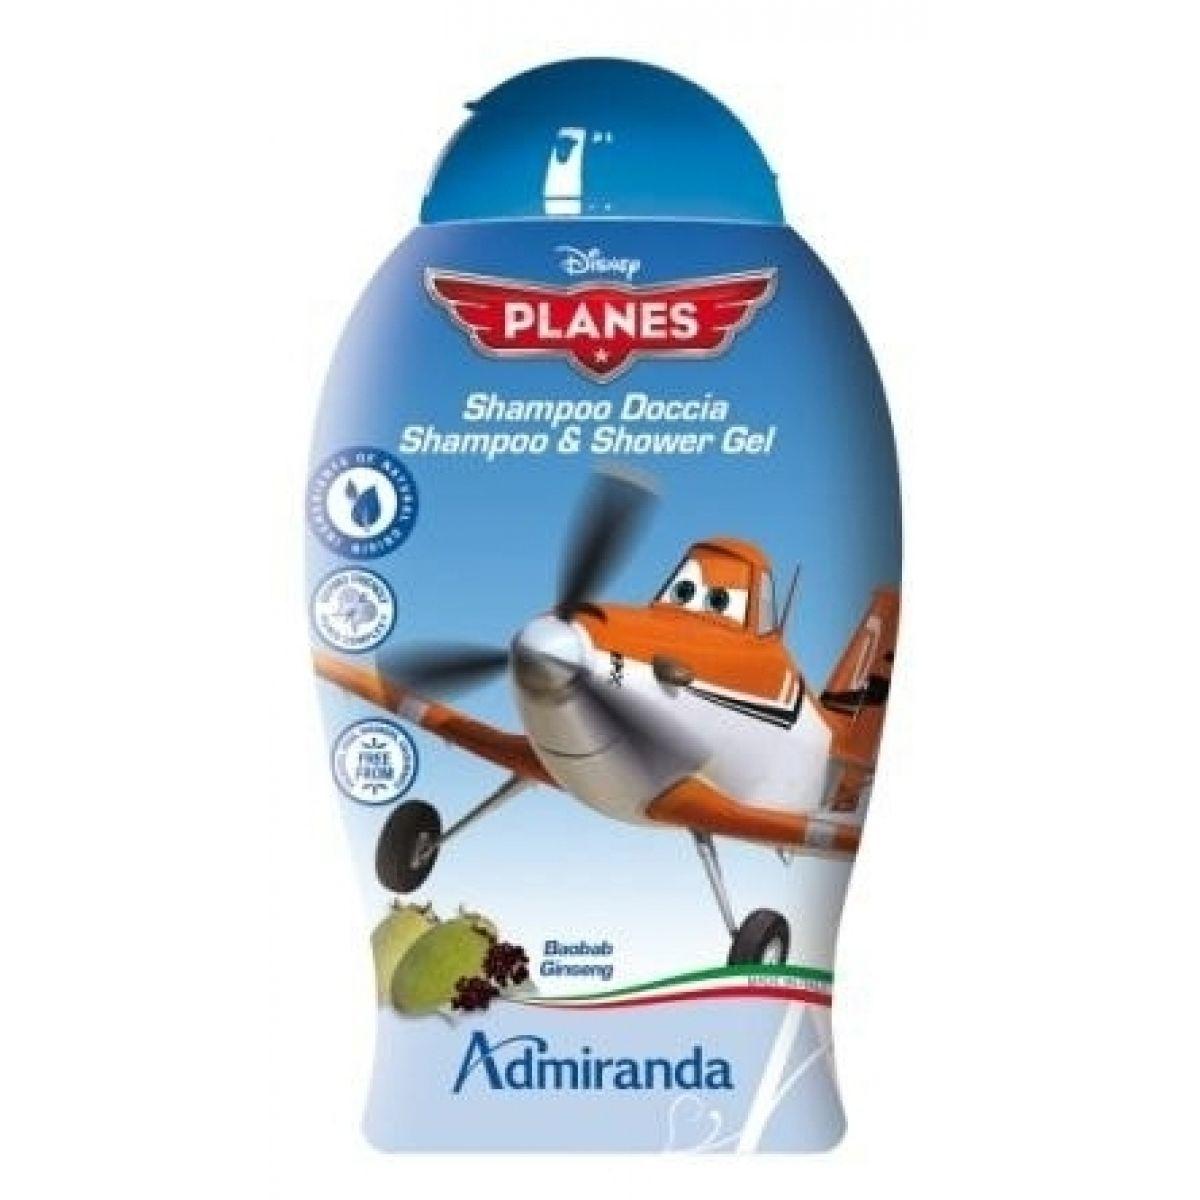 Admiranda Dětský sprchový gel a šampón 250ml Planes s baobabem a ženšenem